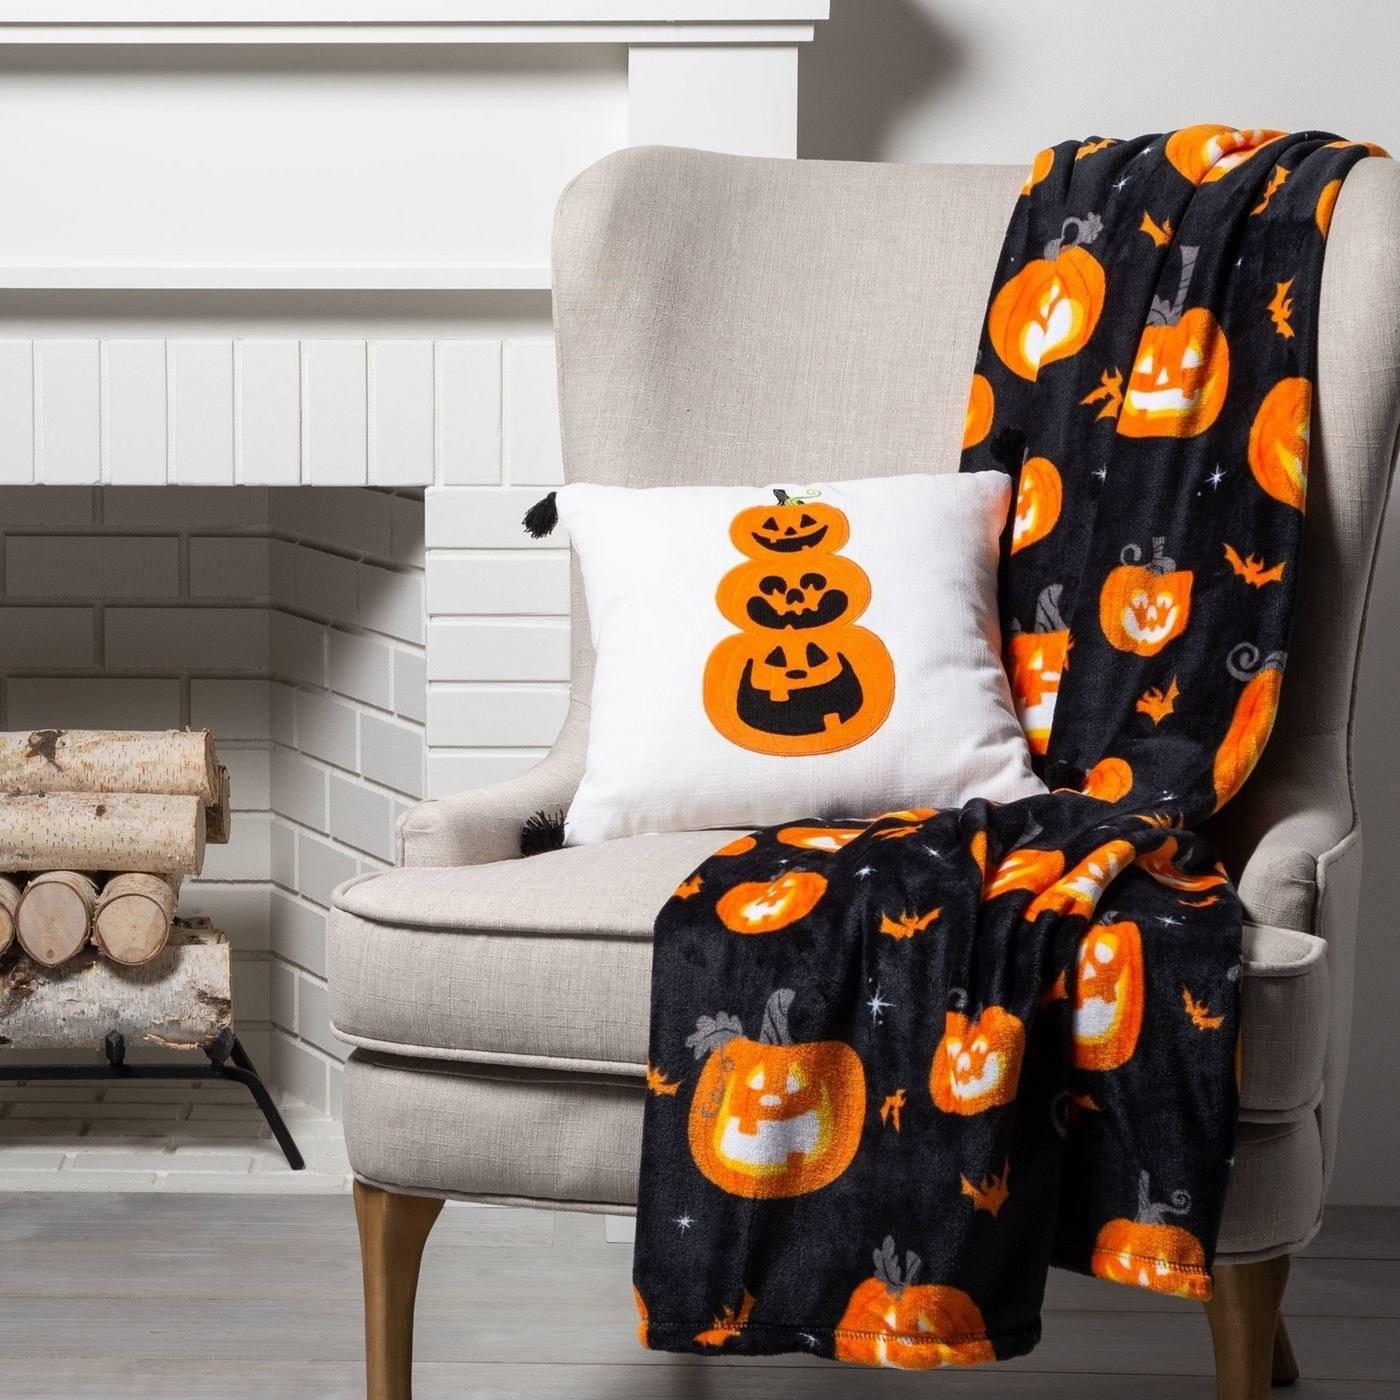 A halloween throw blanket